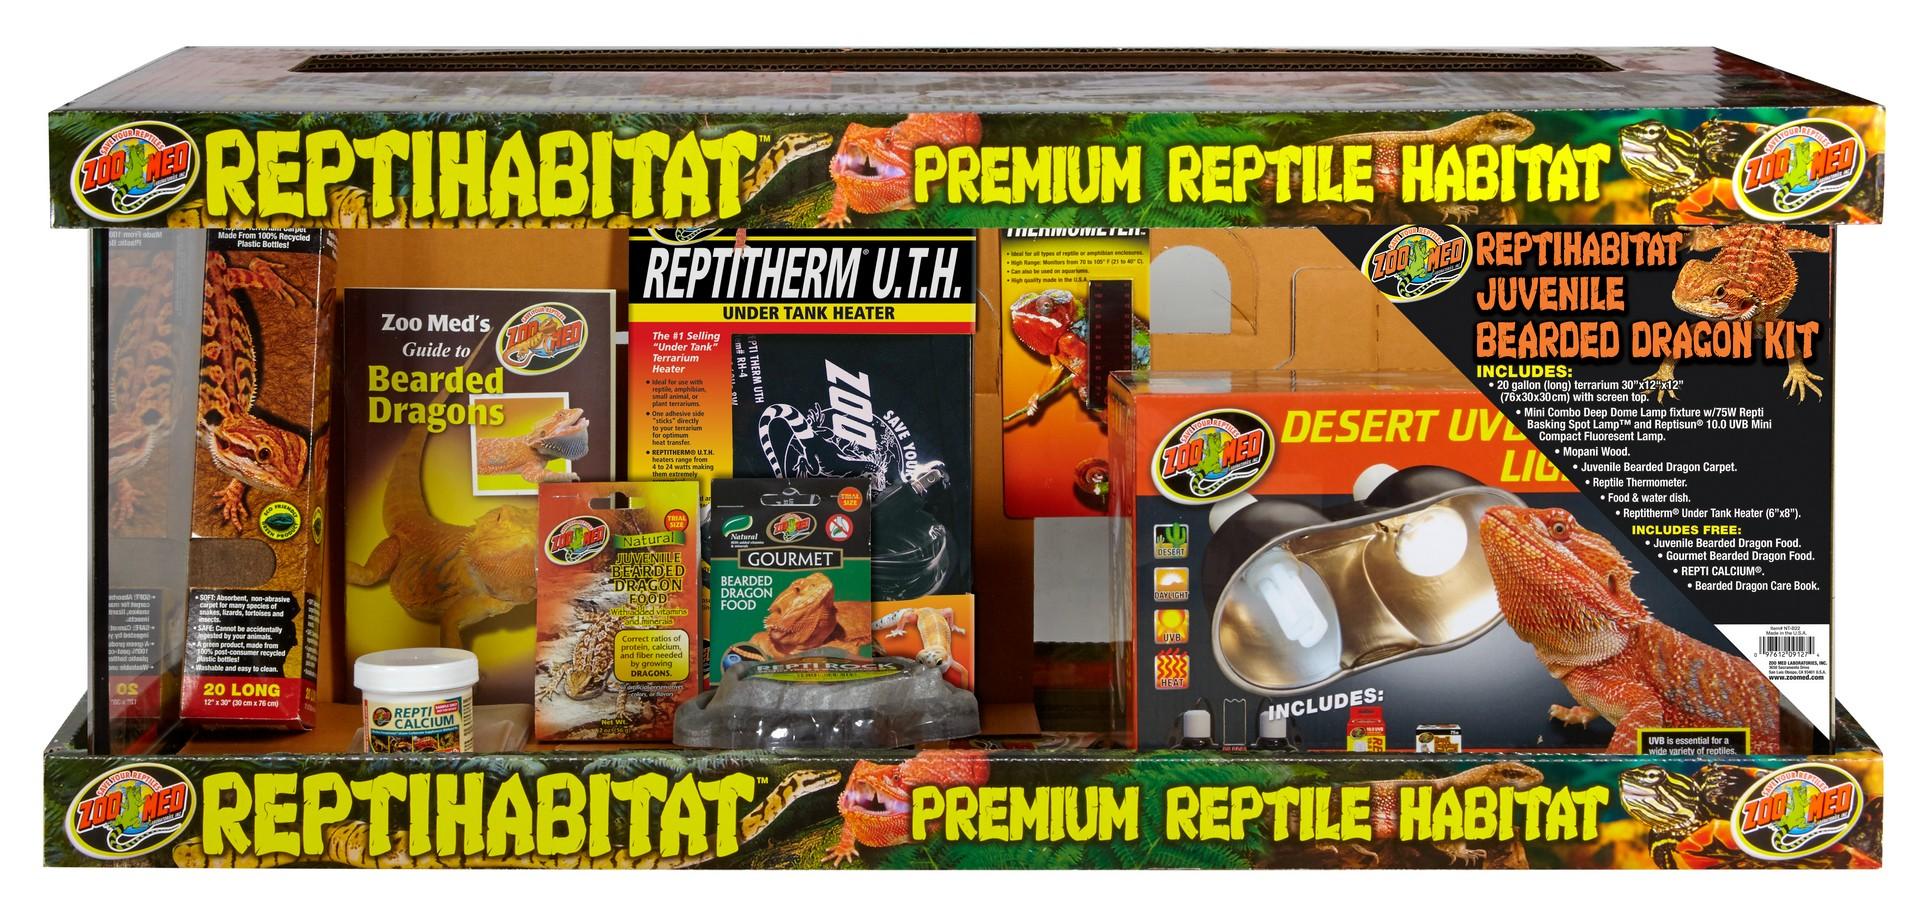 Zoo Med Reptihabitat Premium Reptile Habitat Juvenile Bearded Dragon Kit